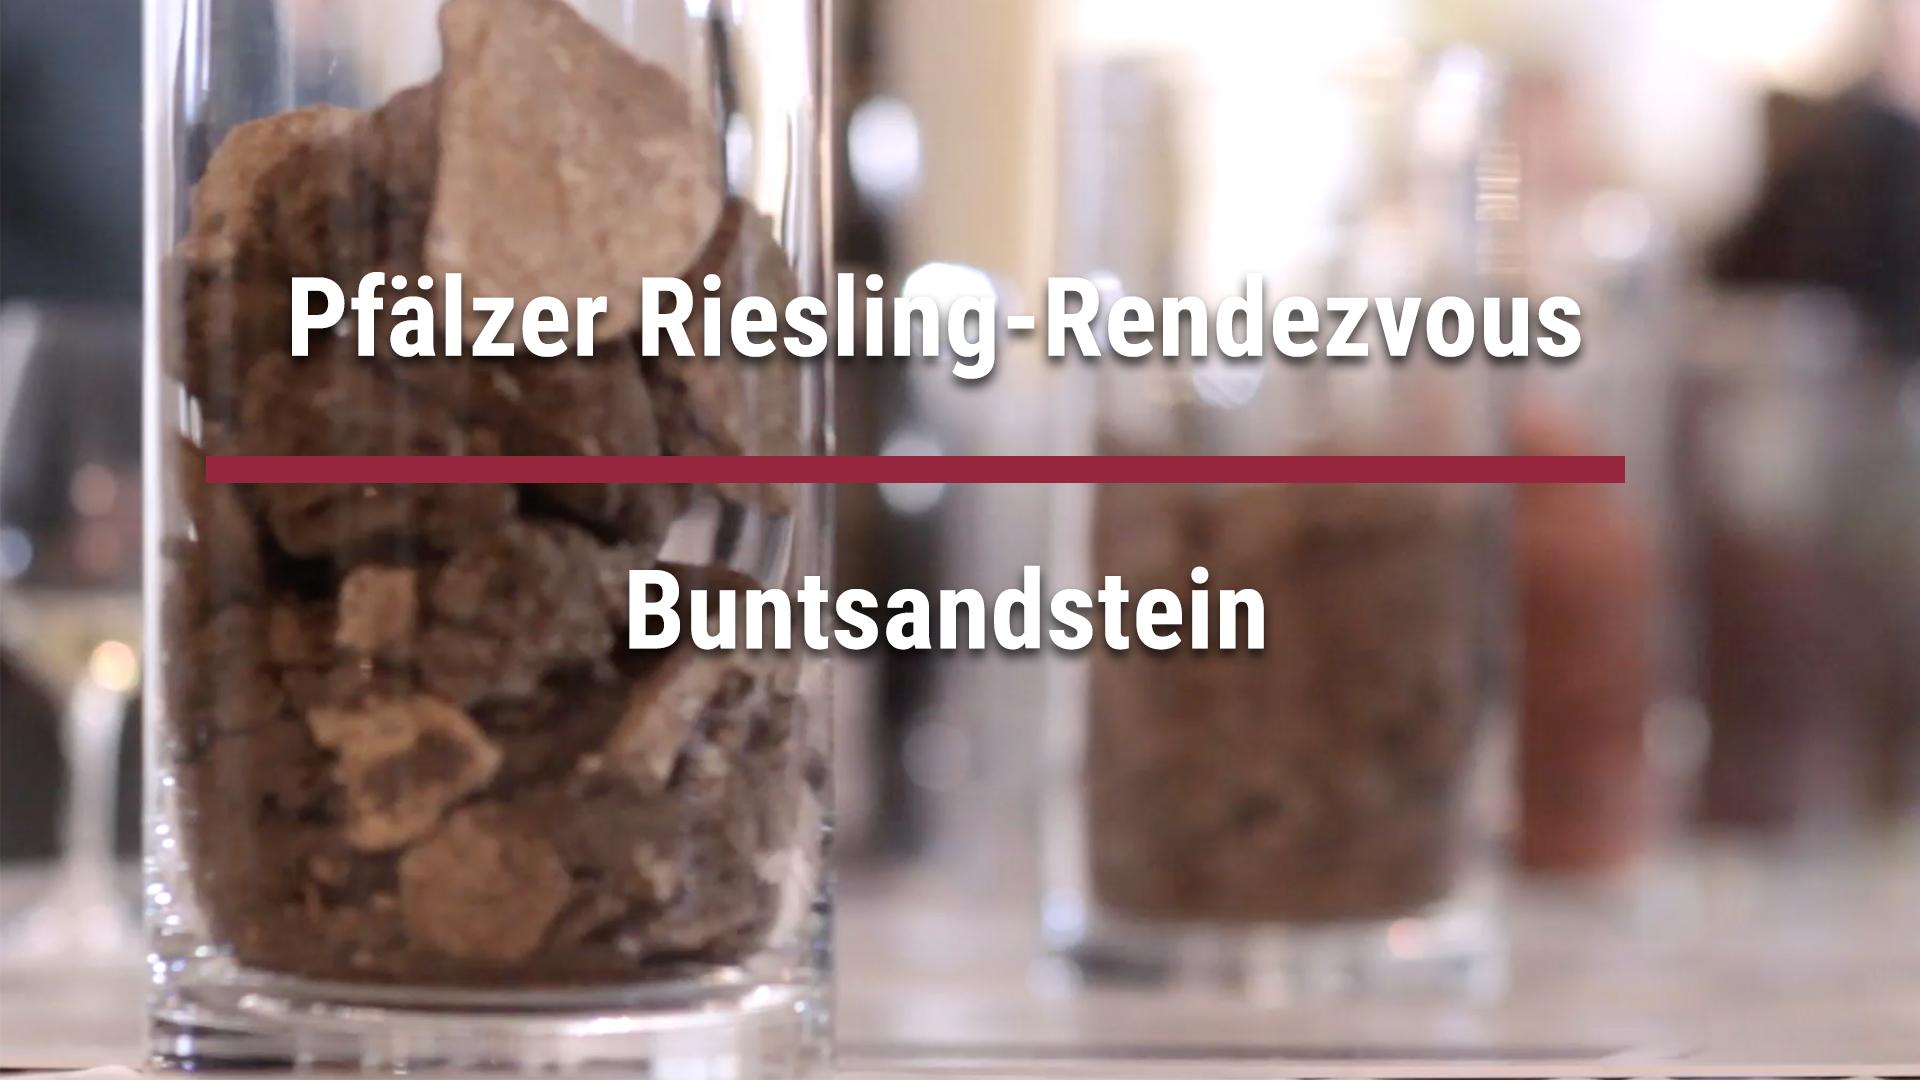 """Pfälzer Riesling-Rendezvous – Riesling-Parcour"" – Buntsandstein"